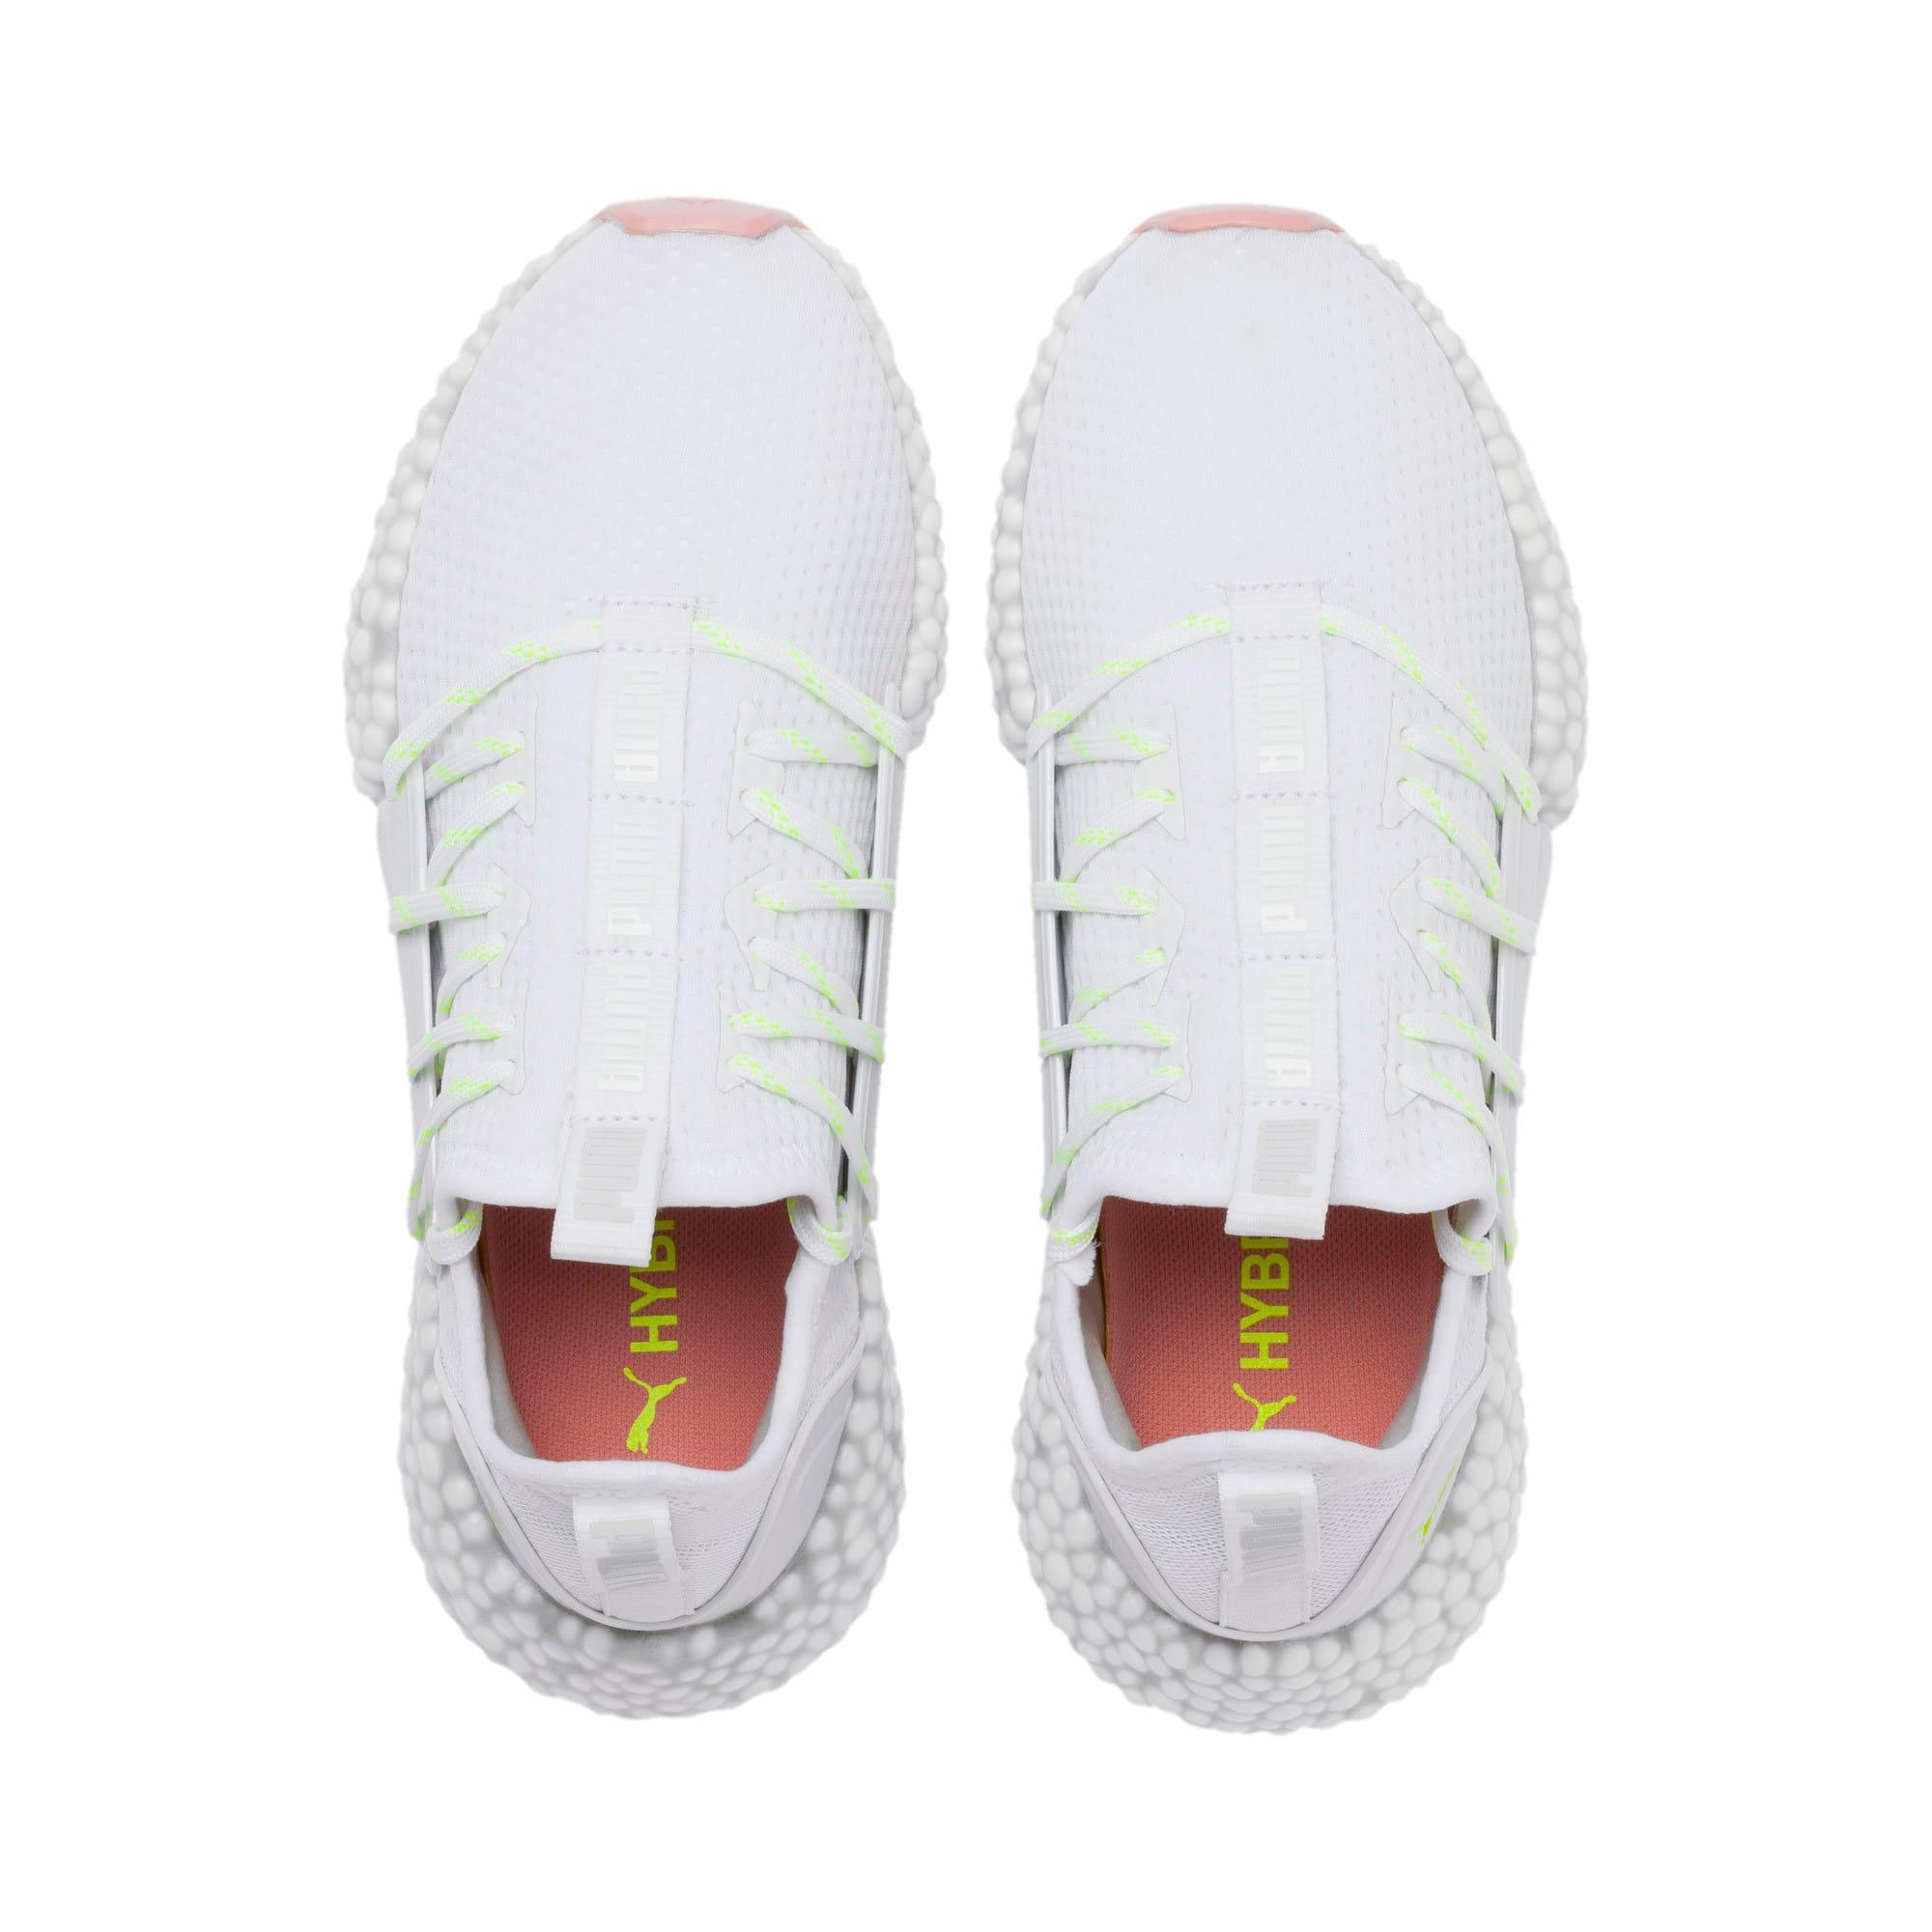 Thumbnail 7 of HYBRID Rocket Aero Women's Running Shoes, Puma White-Bridal Rose, medium